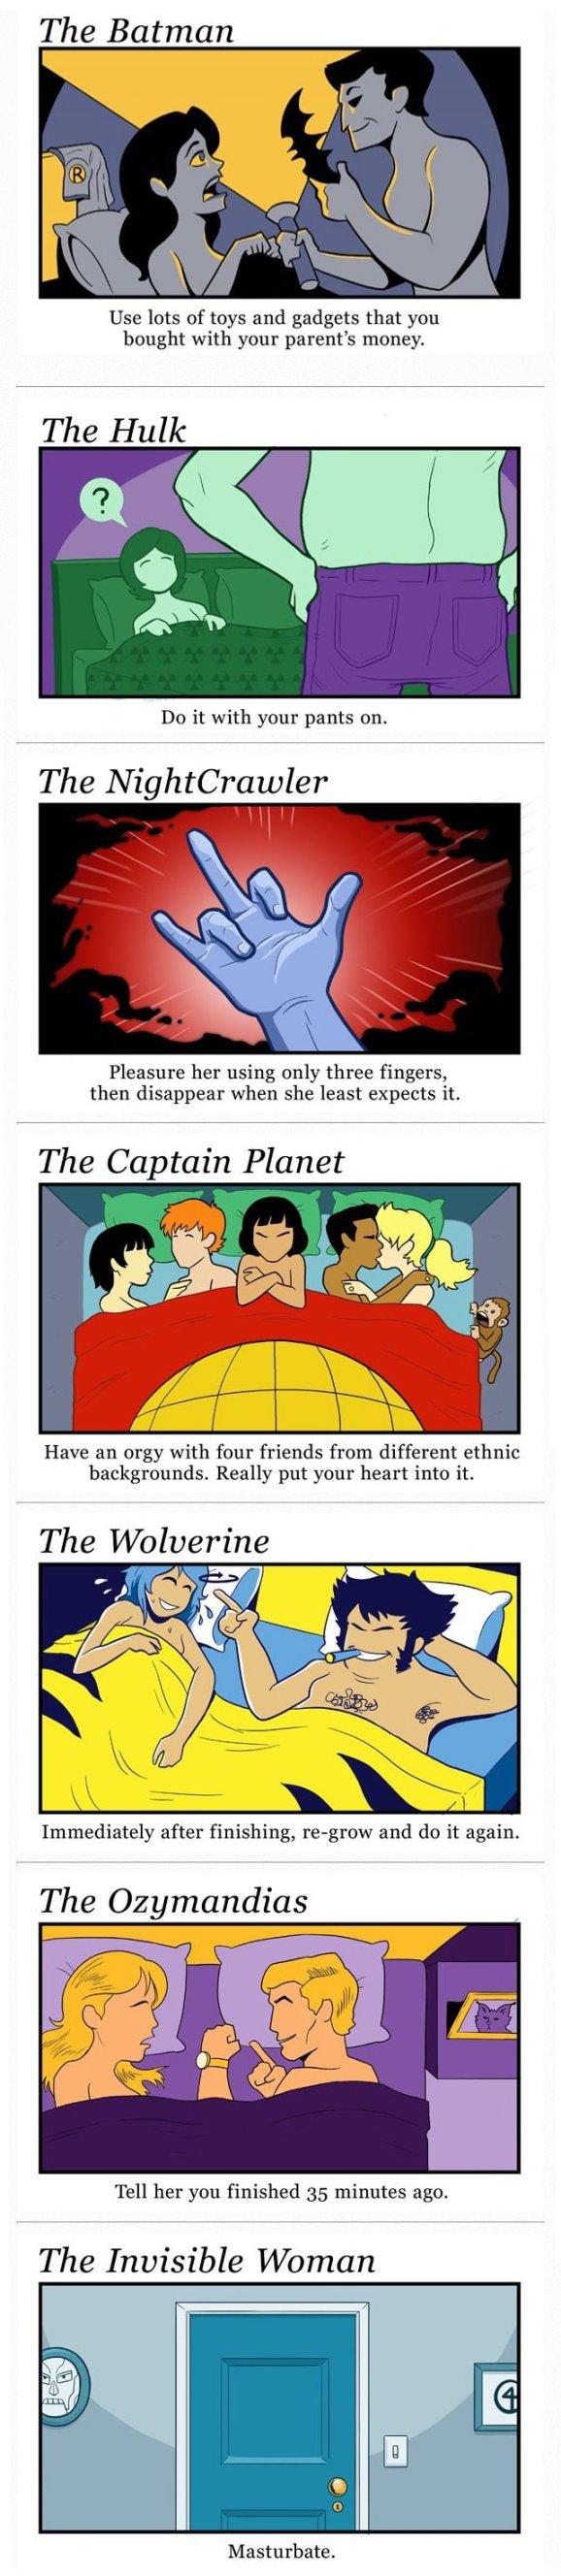 Vamers-Humour-Geekosphere-G-Life-Superhero-Sex